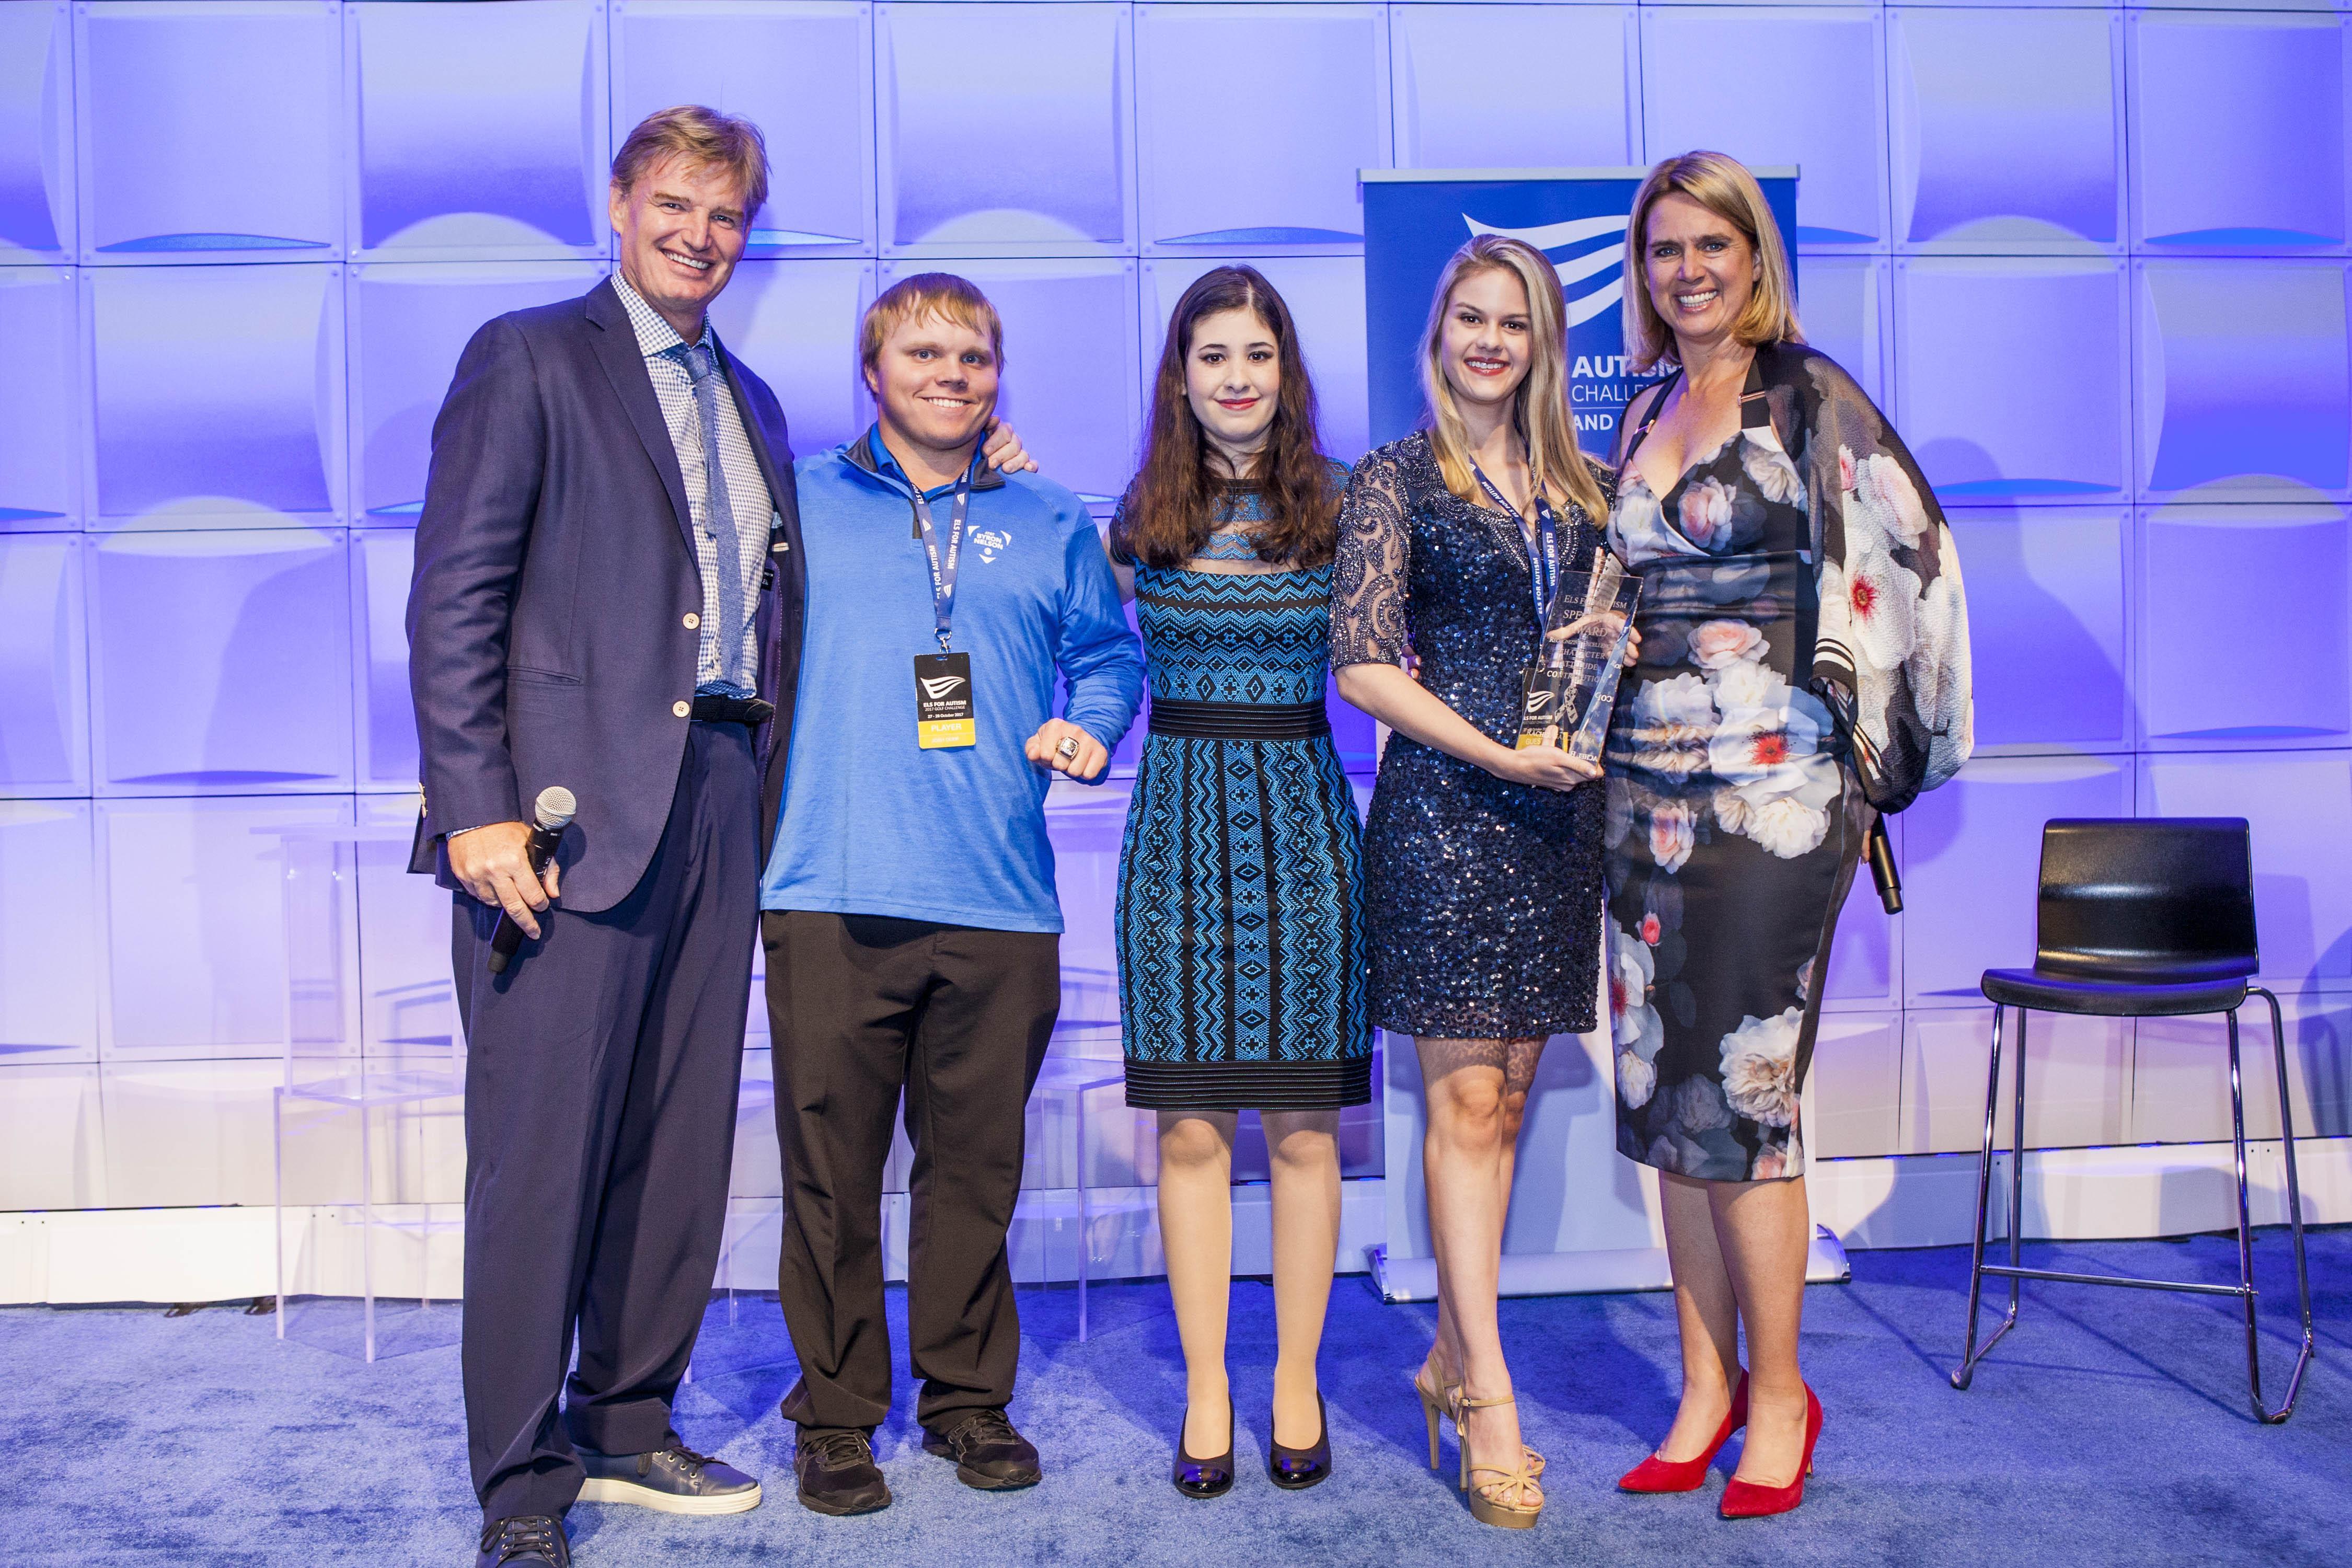 Els for Autism Golf Challenge Awards Ceremony